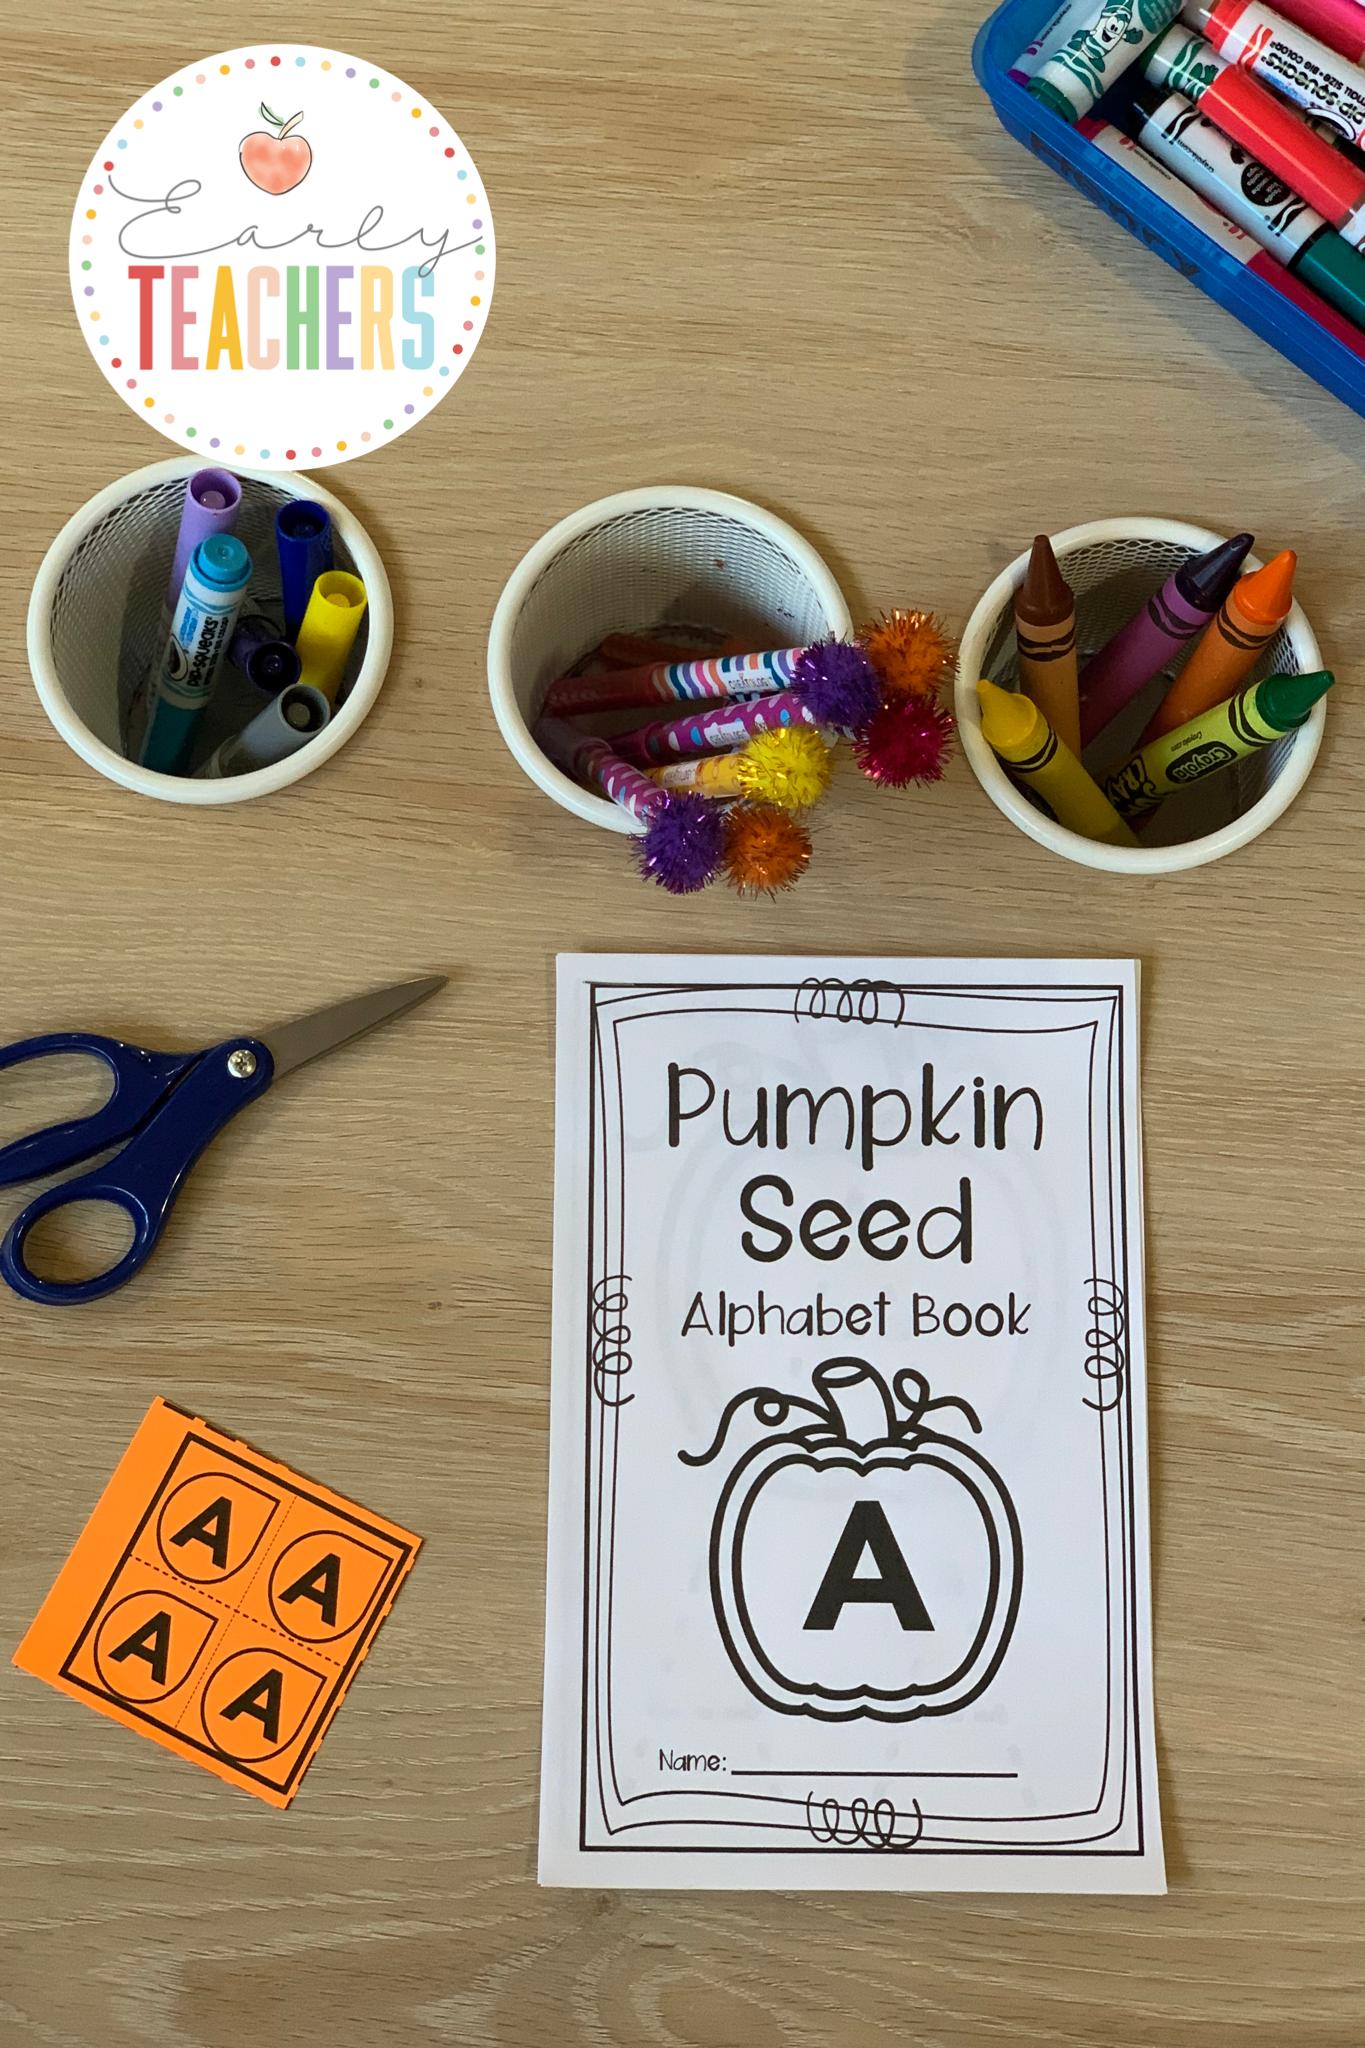 Pumpkin Alphabet Booklet - Early Teachers